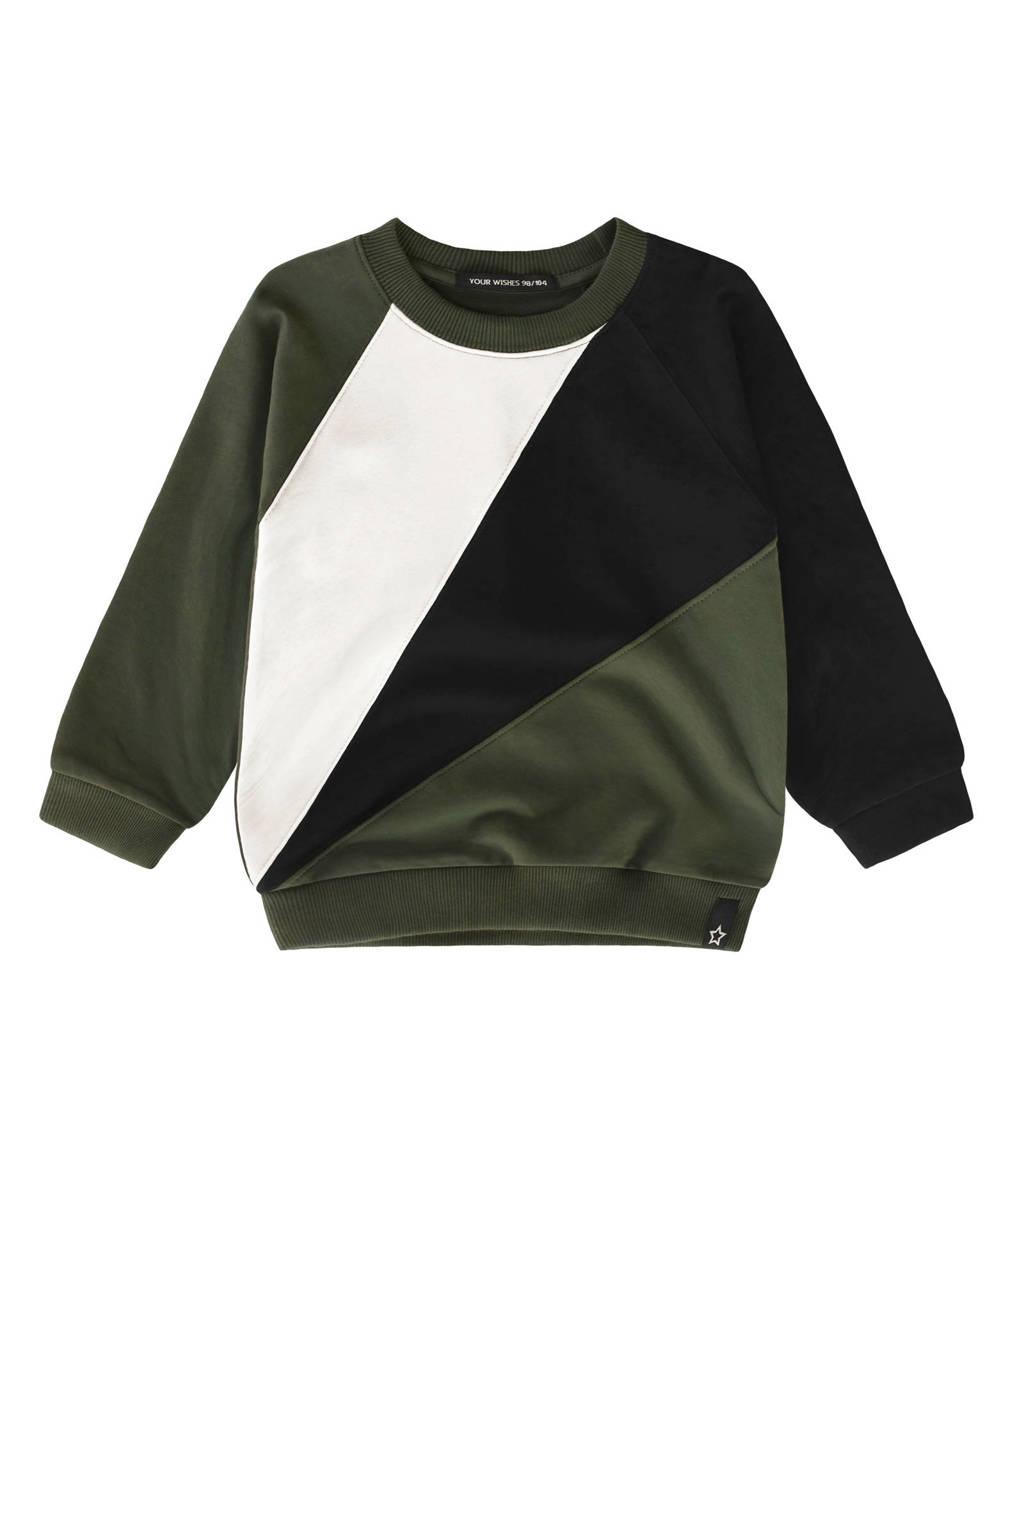 Your Wishes sweater groen/wit/zwart, Groen/wit/zwart